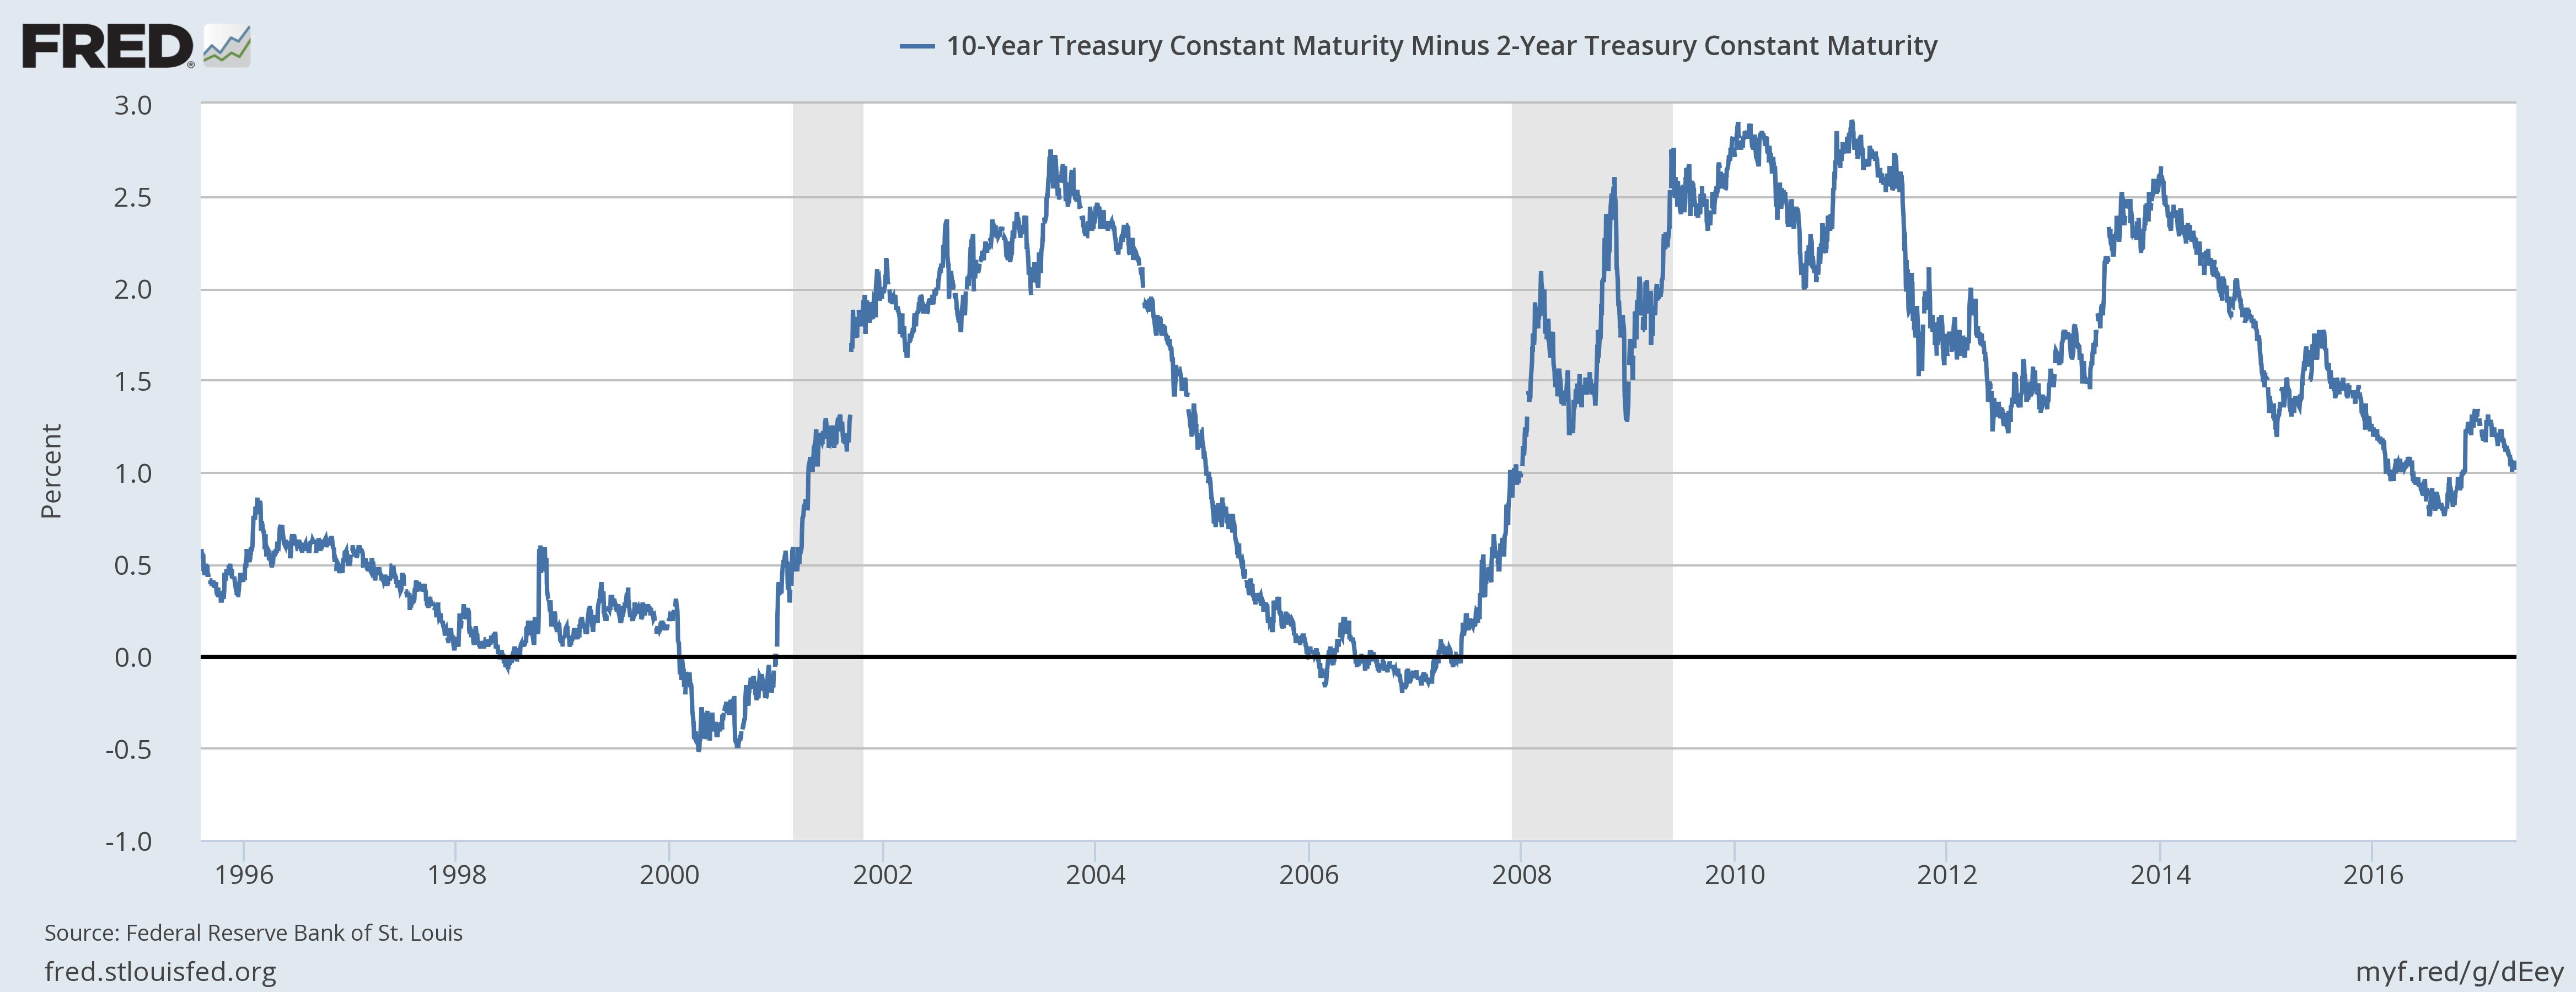 10- Year Treasury Constant Maturity 1996-2017